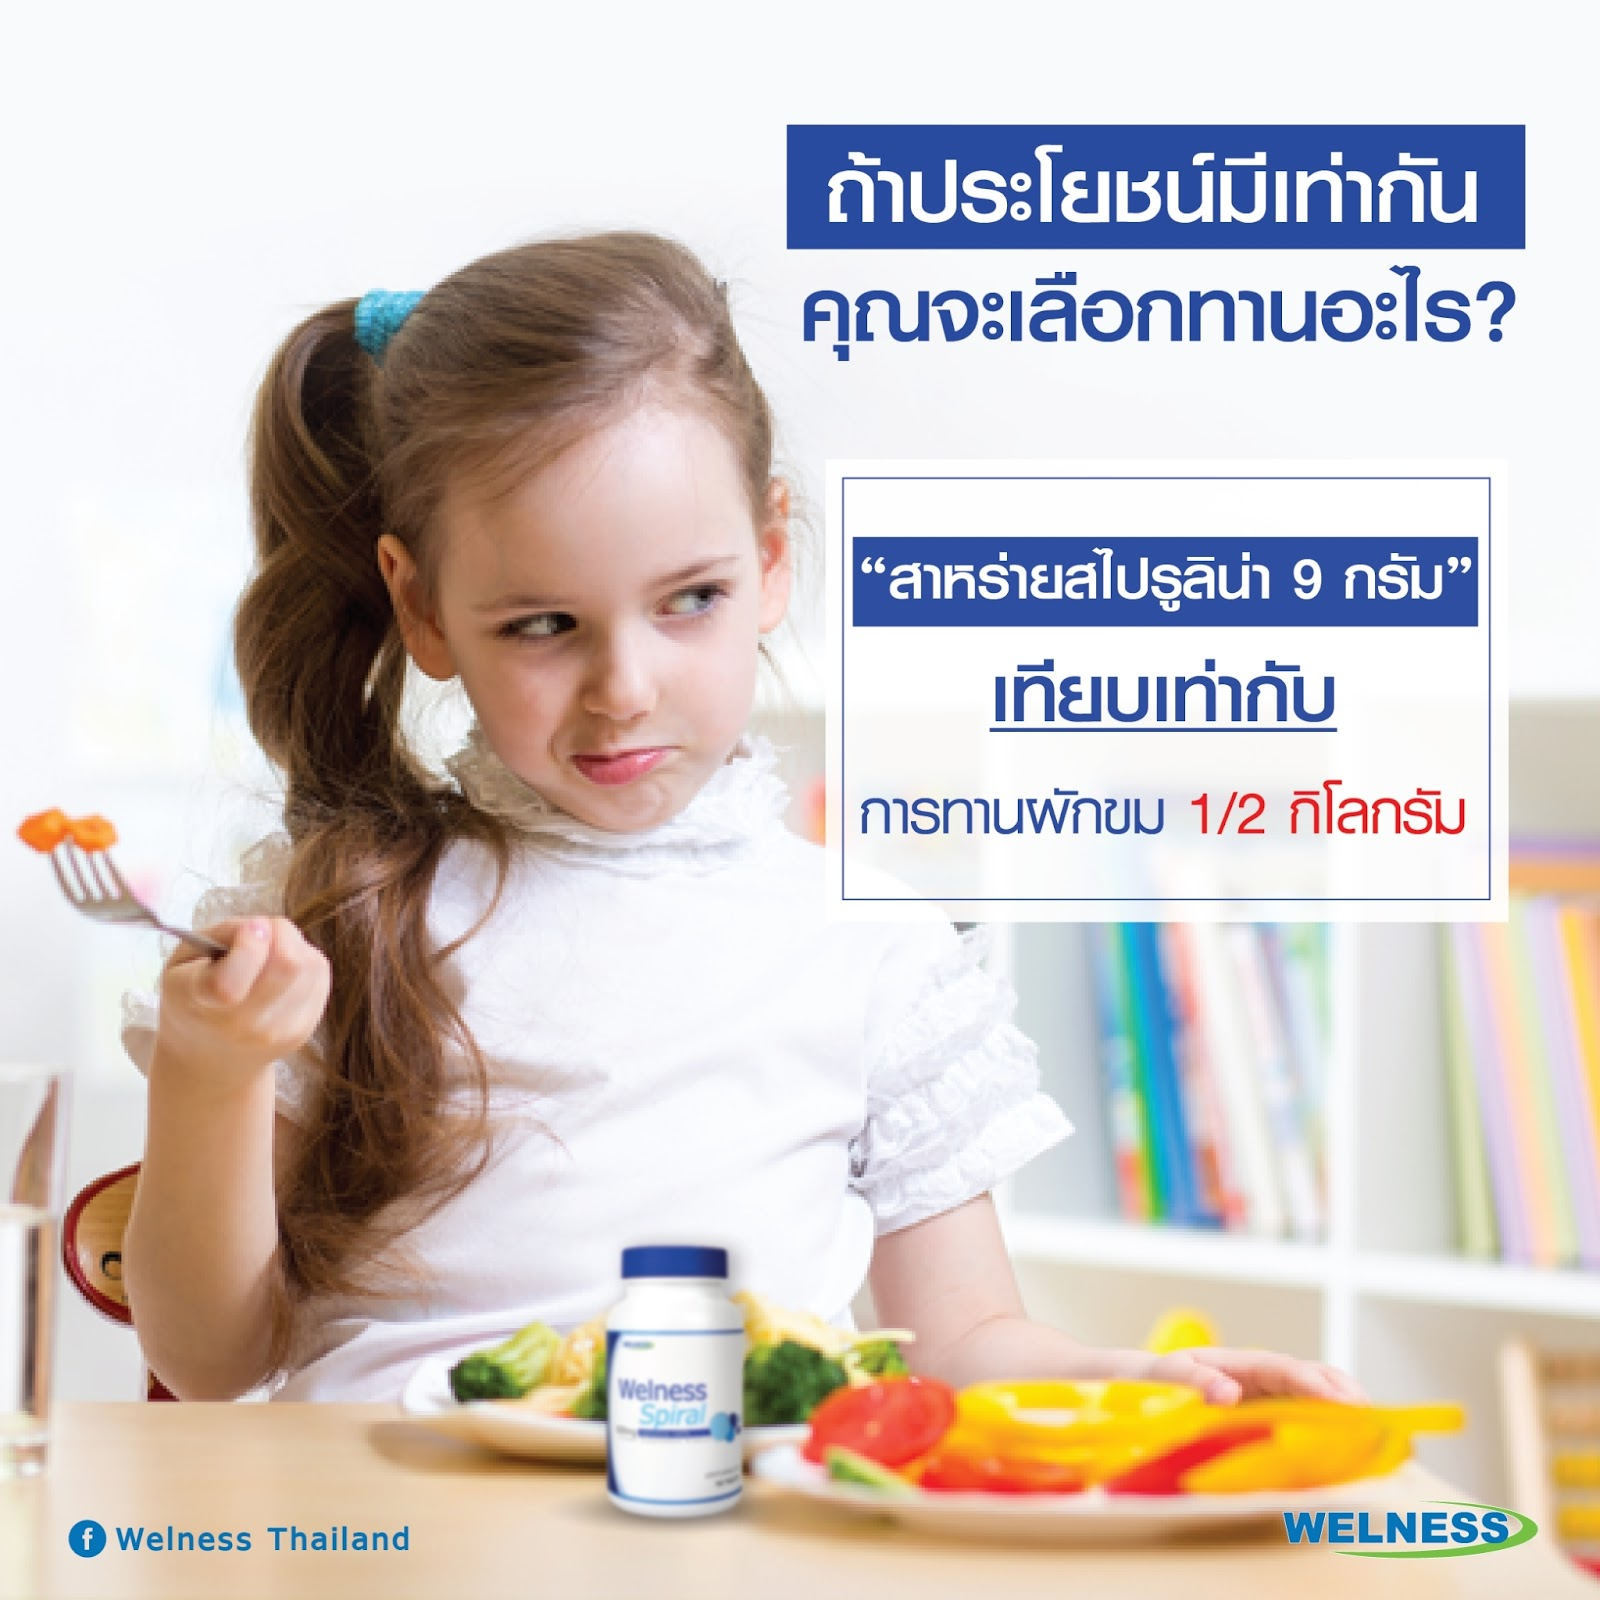 ads_๑๗๐๒๑๗_0005.jpg